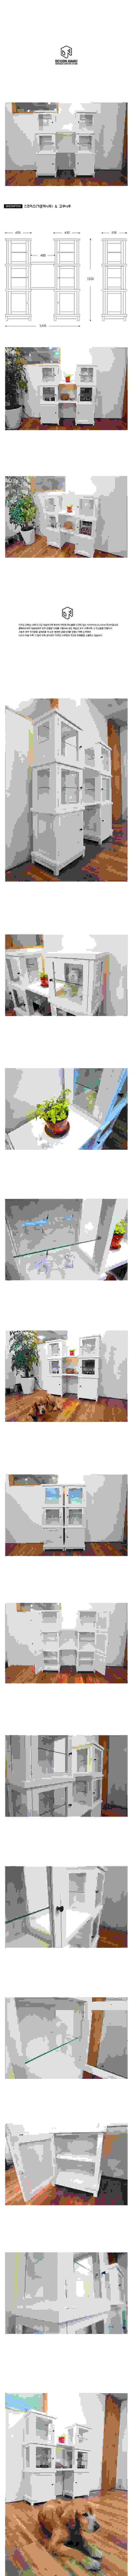 White glass cabinet set : Design-namu의 클래식 ,클래식